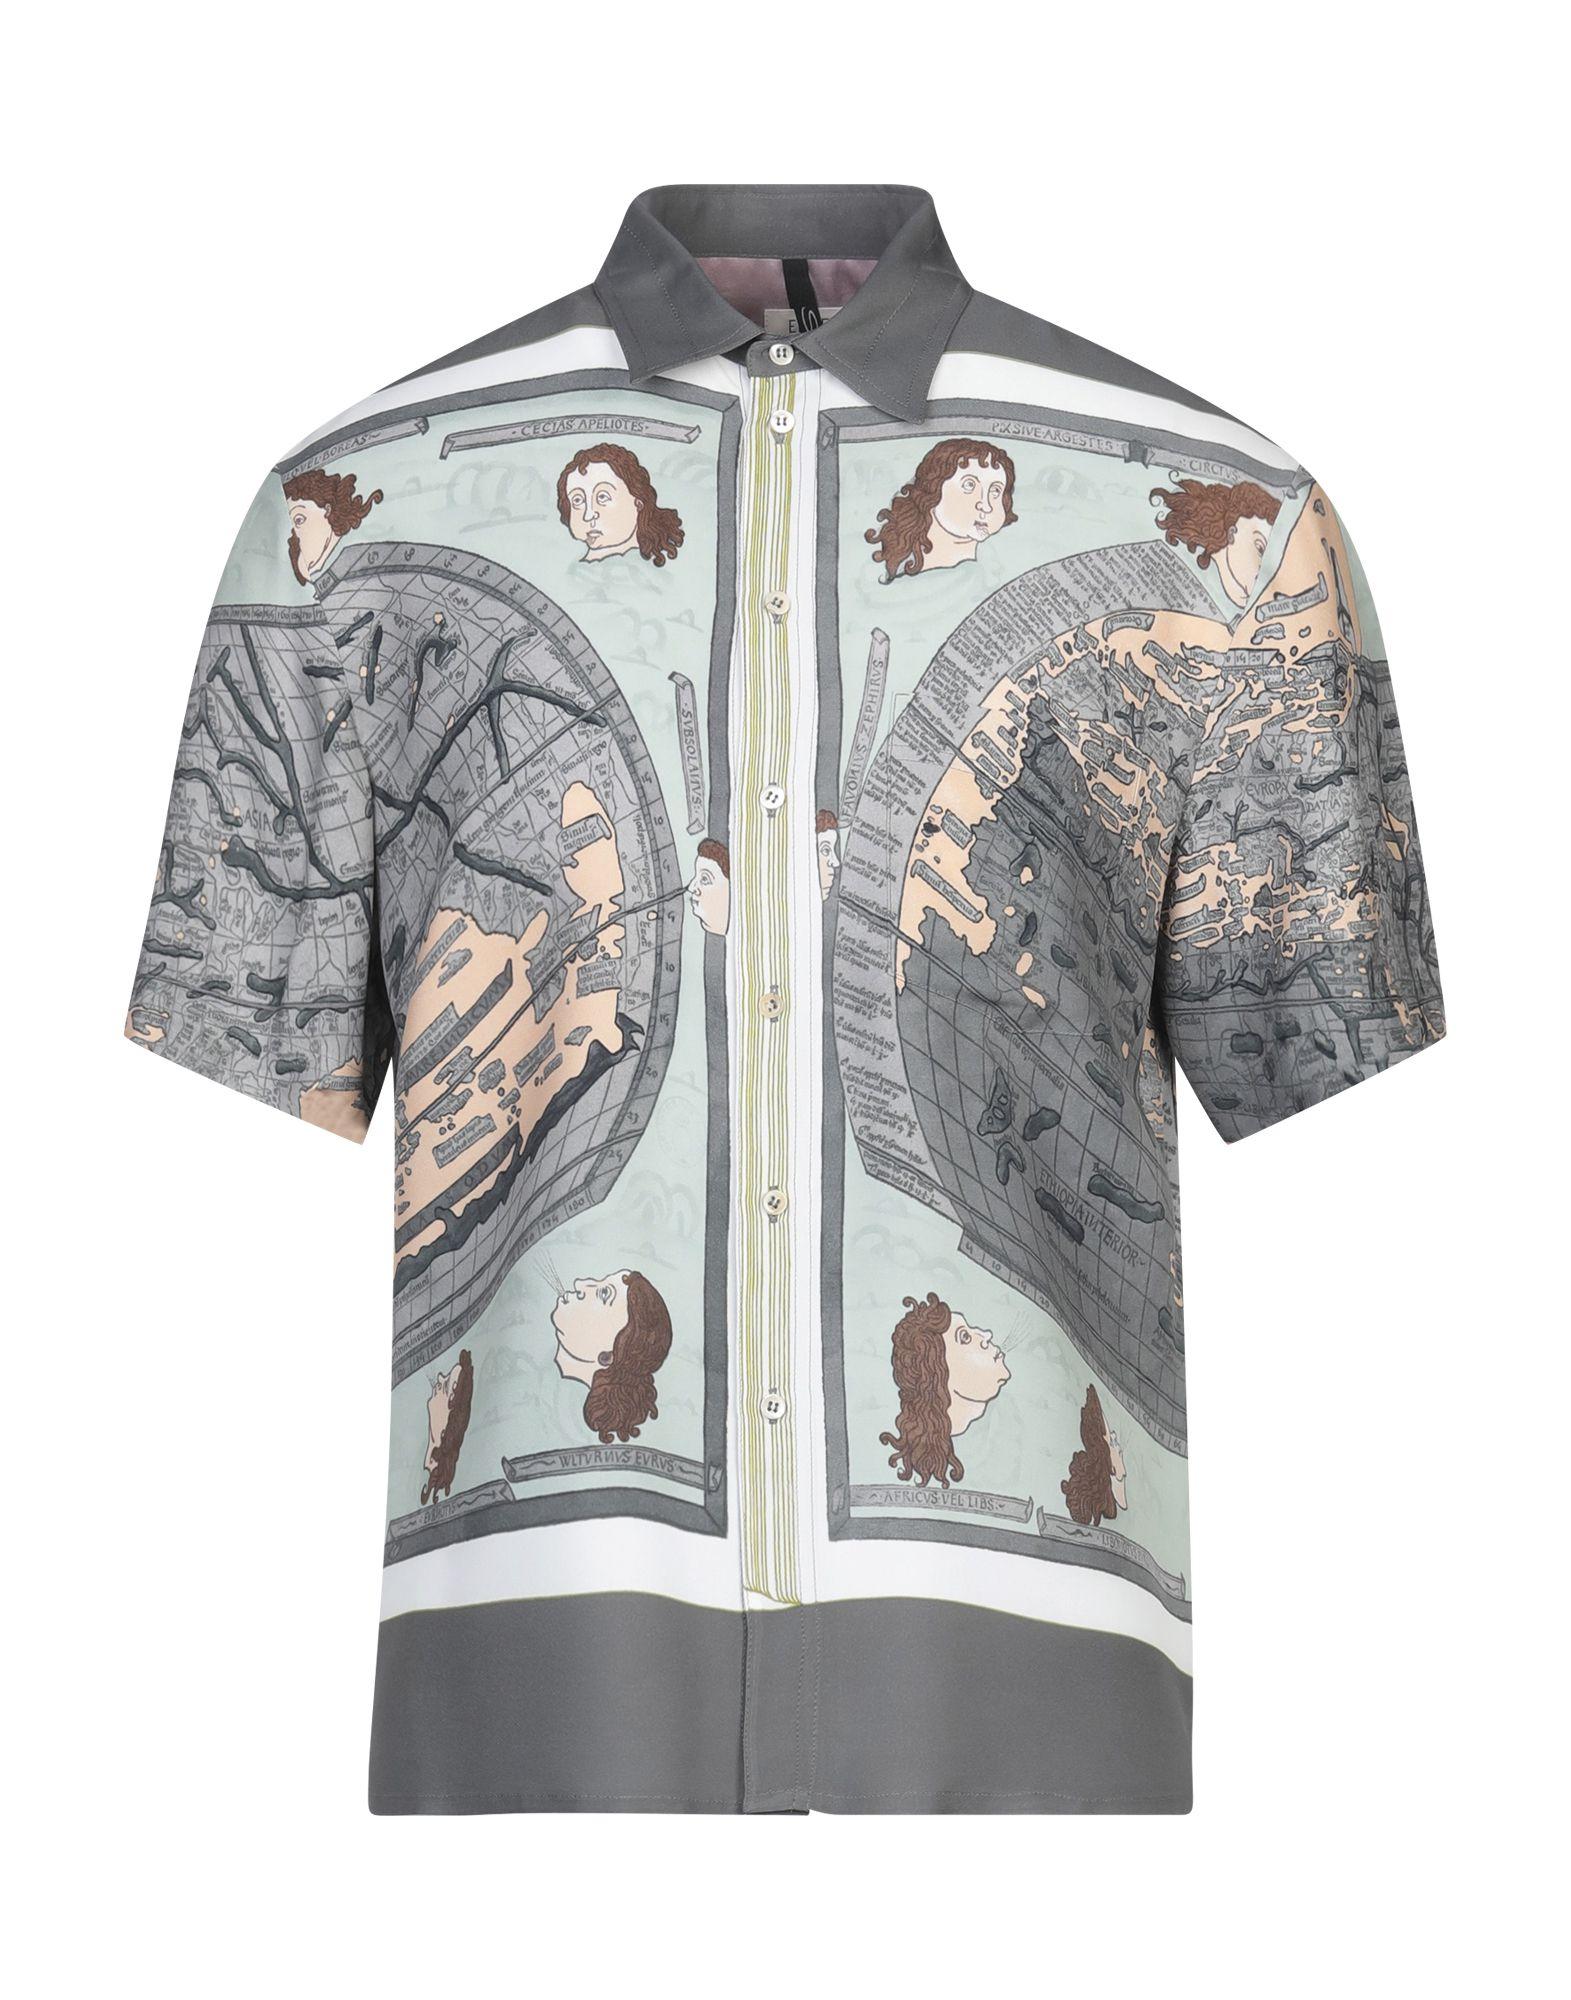 SANTONI Shirts. crepe, no appliqués, multicolor pattern, front closure, button closing, short sleeves, classic neckline, single chest pocket. 100% Viscose